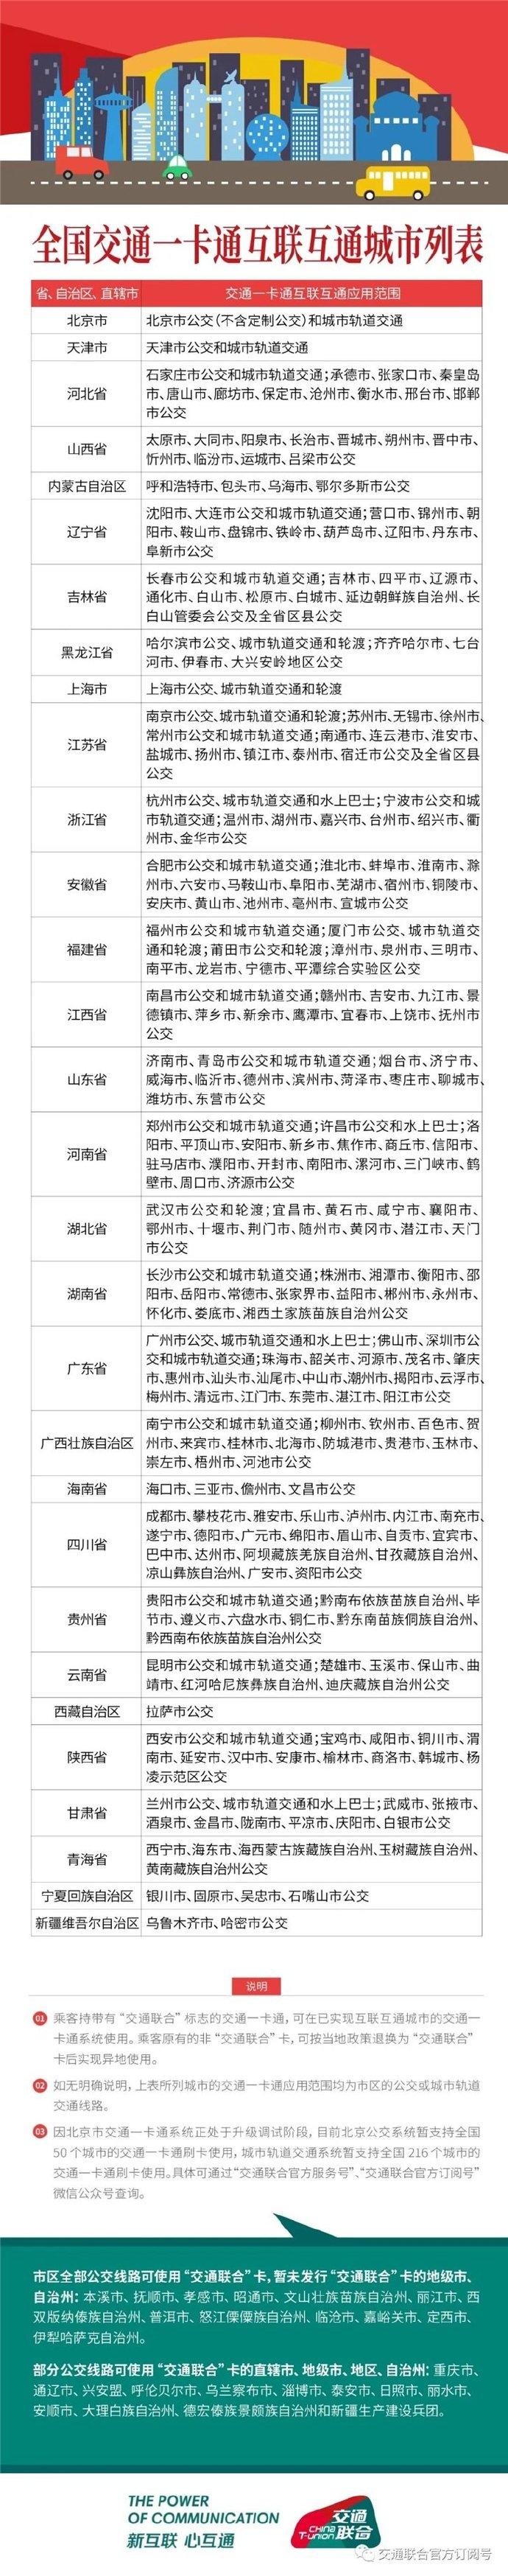 Apple Pay「江苏交通一卡通 · 苏州」常见问题会总结解答